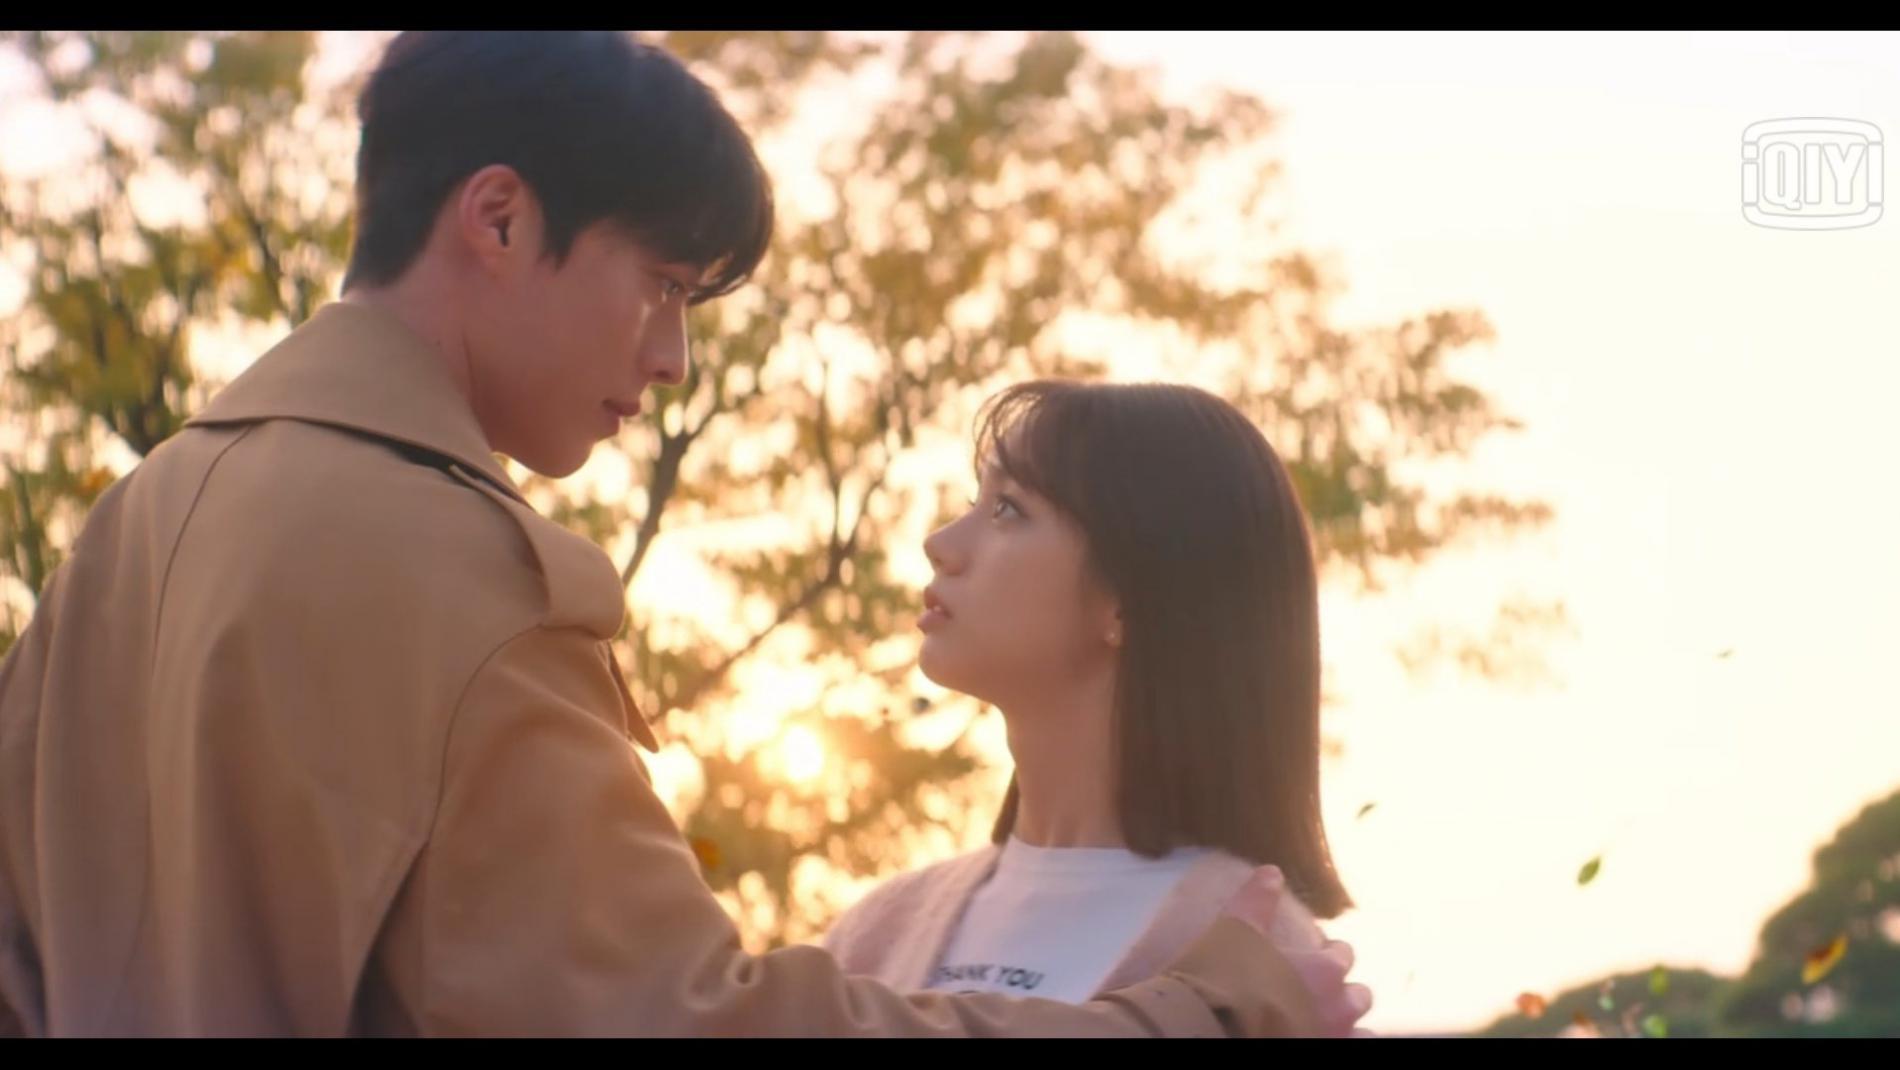 Drama Korea My Roommate Is A Gumiho Episode 1 Sub Indo, Perjanjian Tinggal Bersama